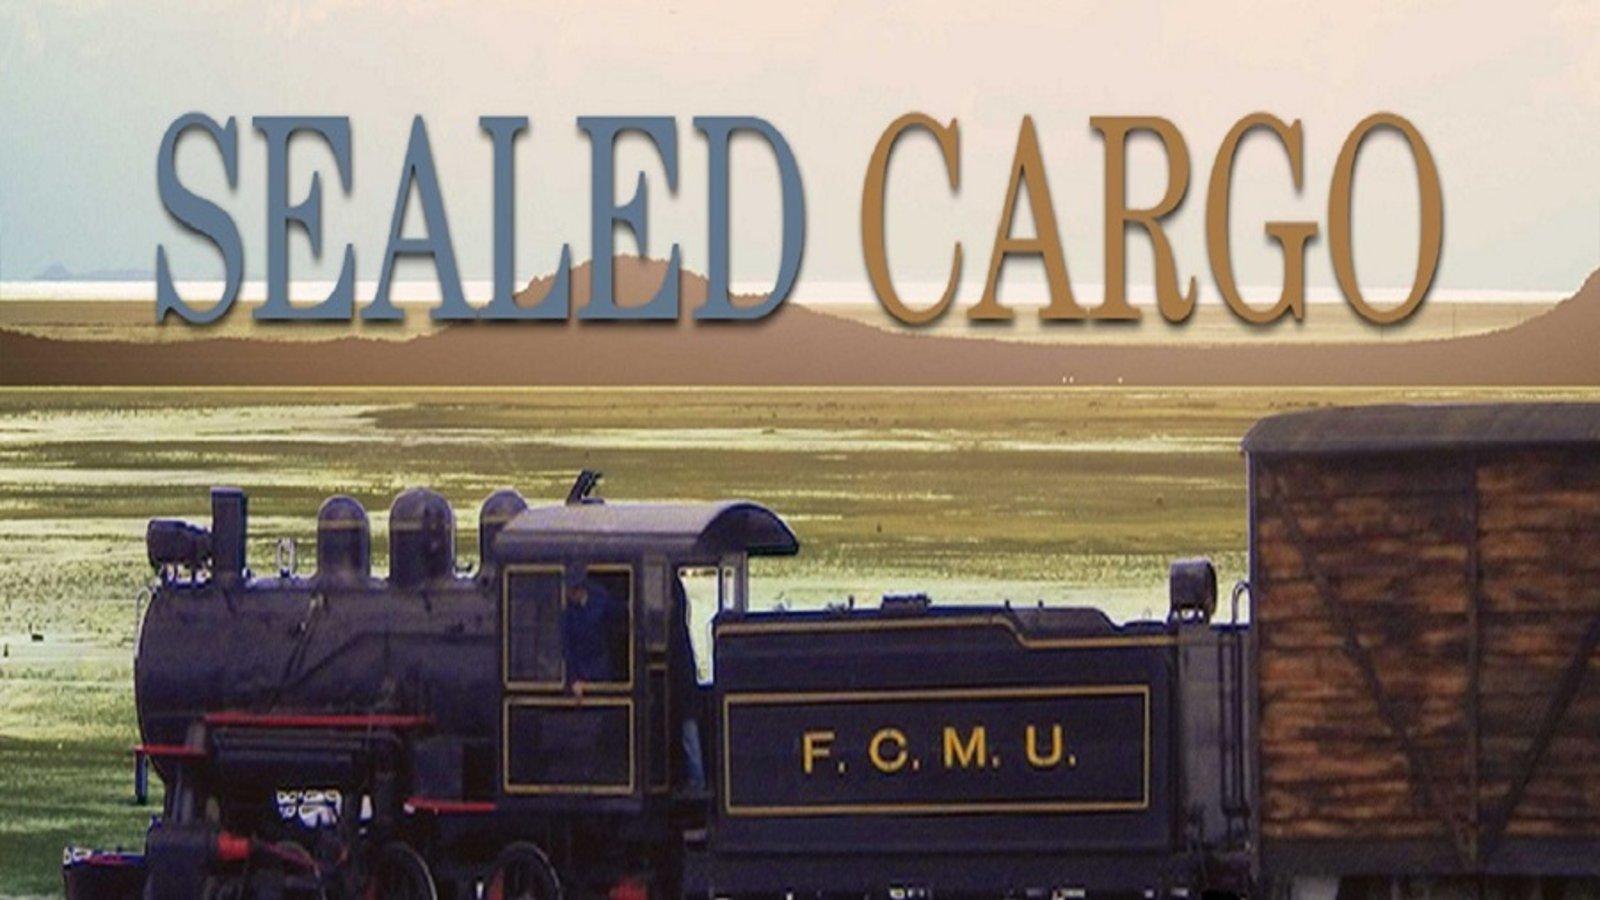 Sealed Cargo - Carga Sellada